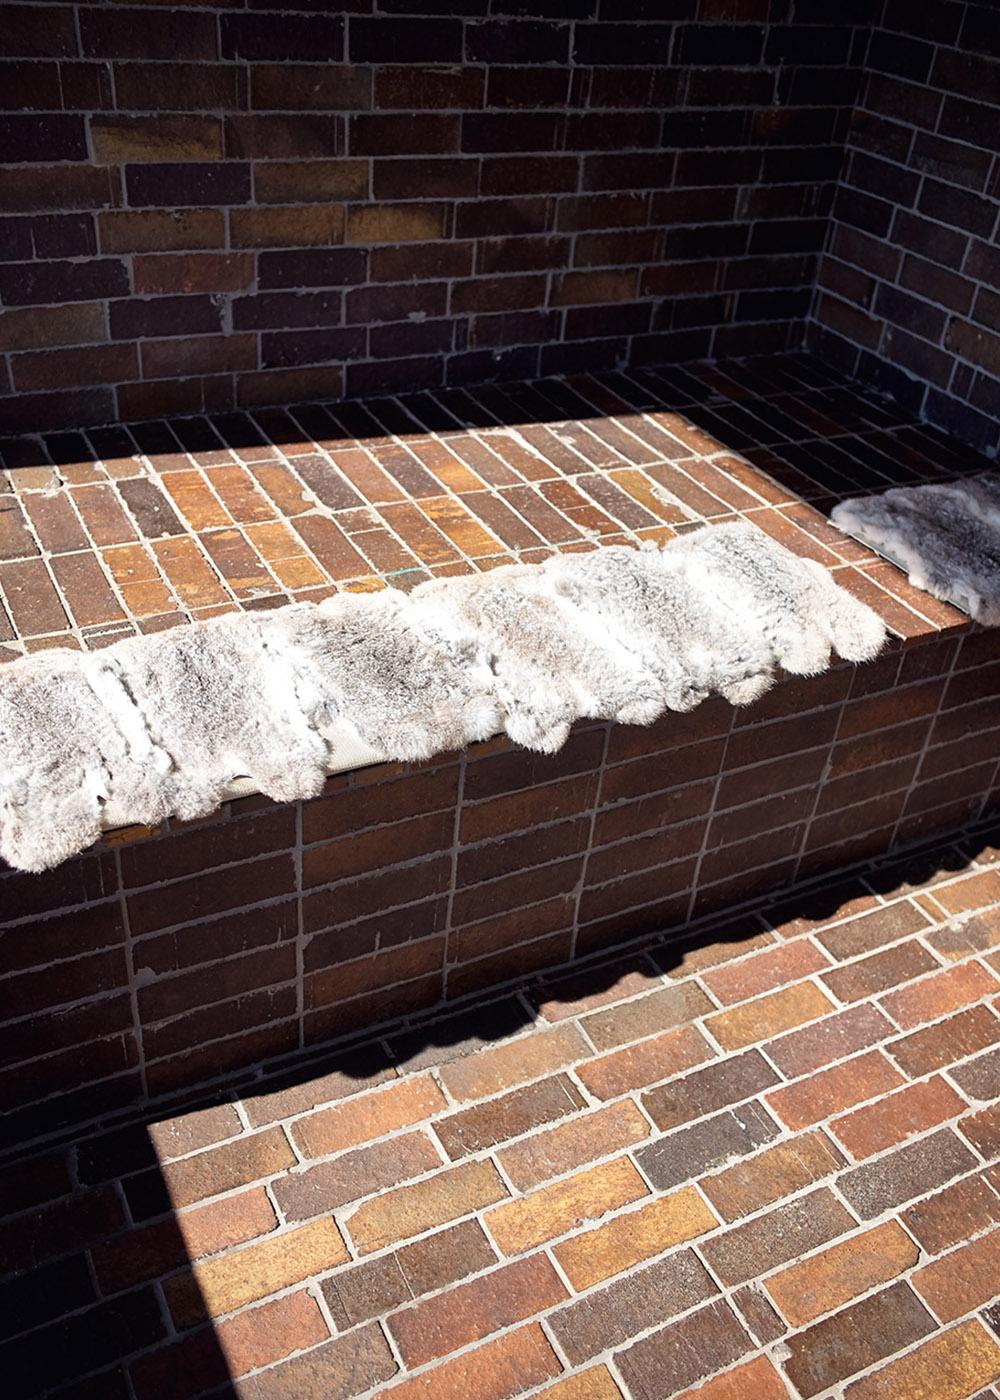 webres 181206 Krause Bricks 1307.jpg